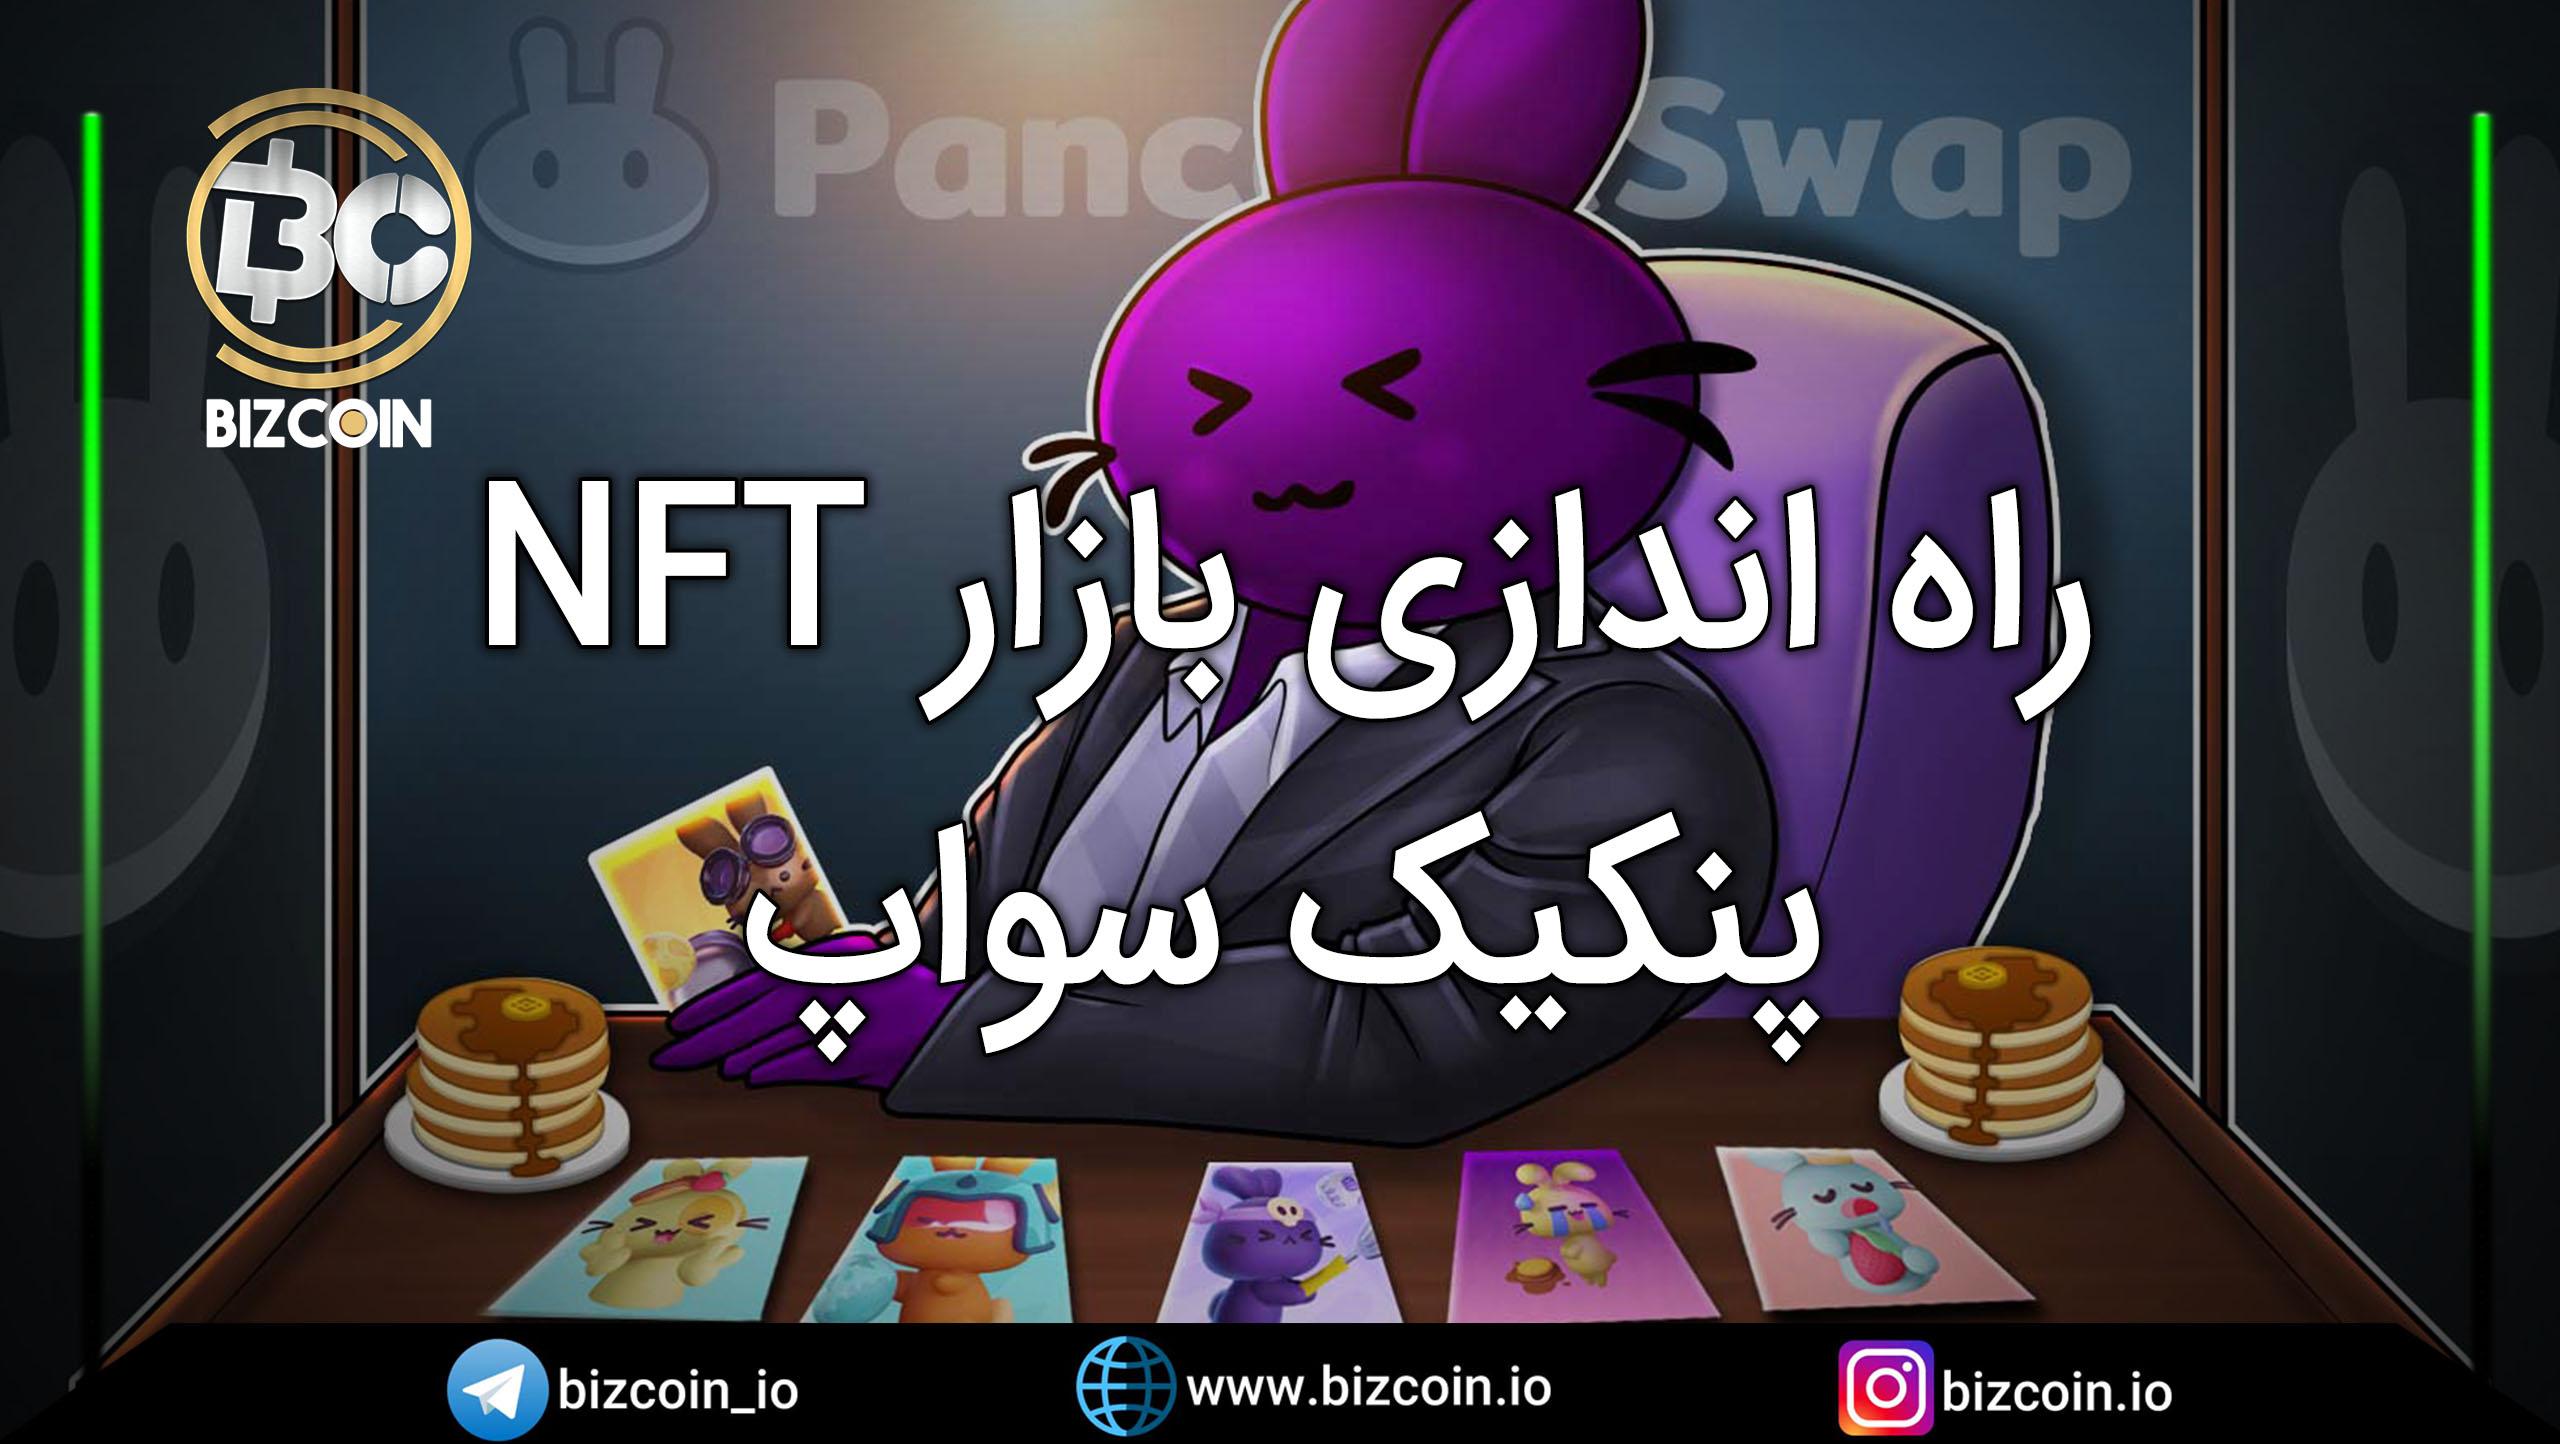 Launching the NFT market for swap pancake راه اندازی بازار NFT پنکیک سواپ